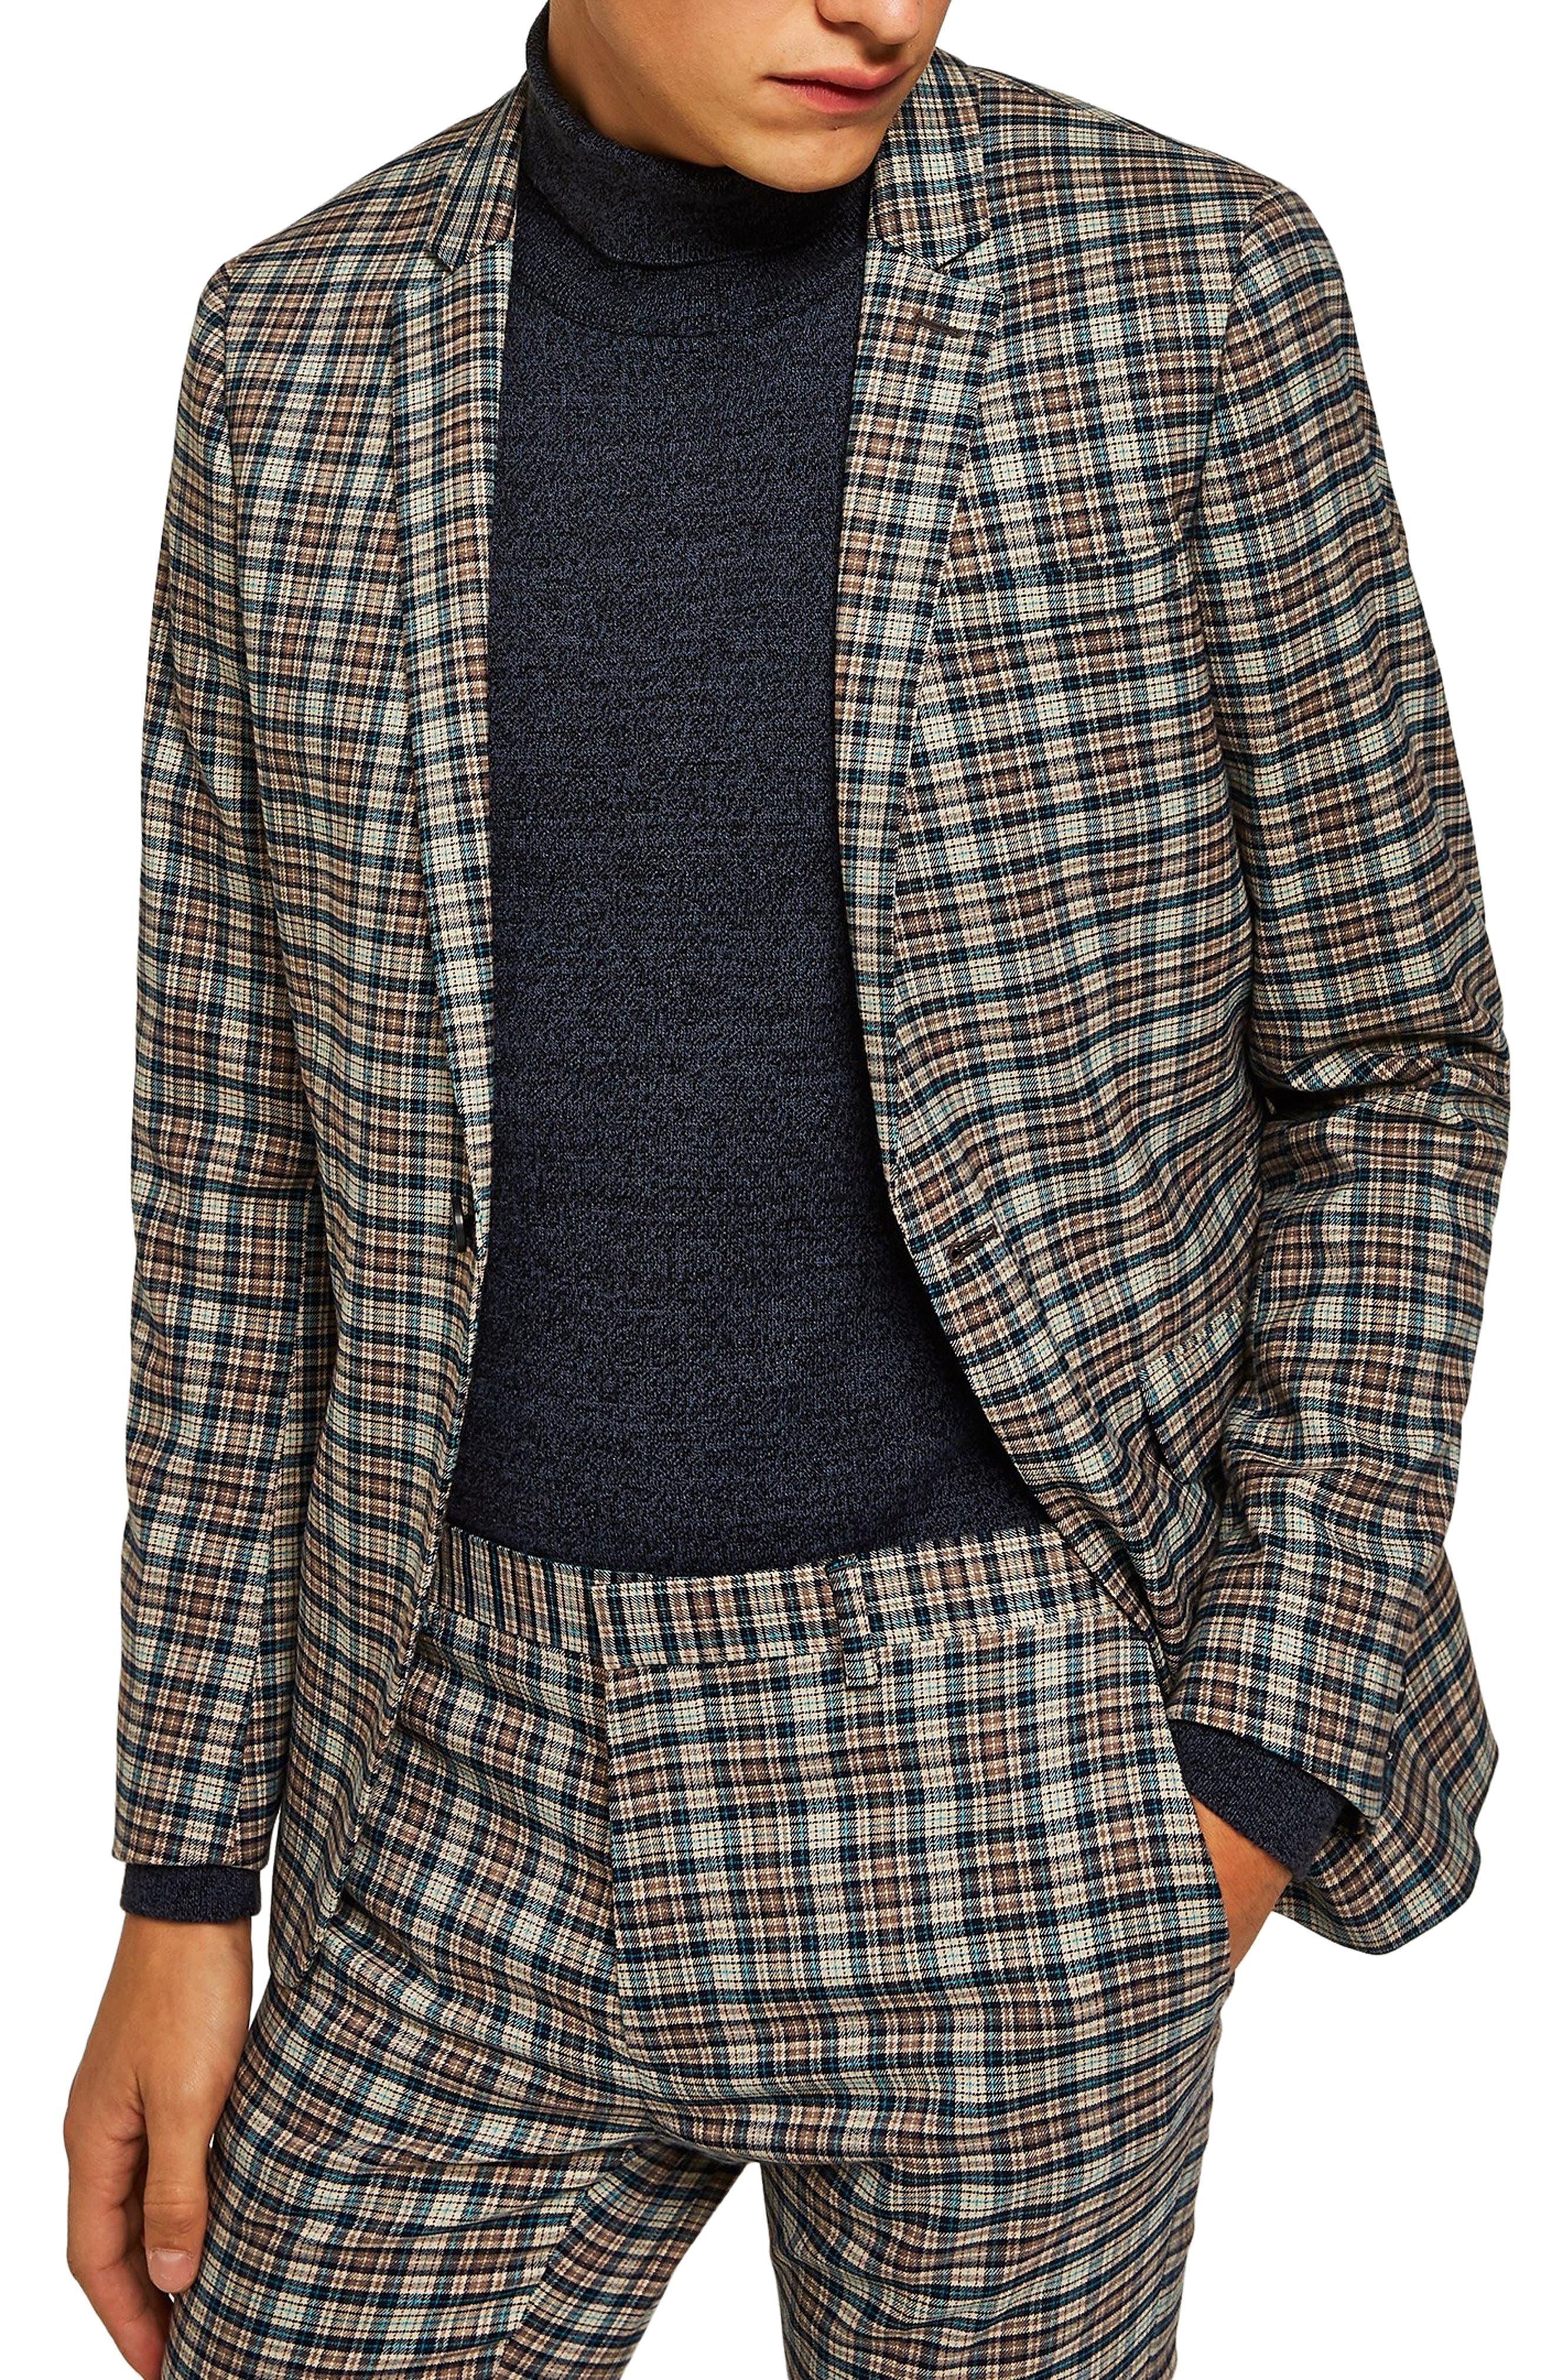 Ultra Skinny Fit Check Suit Jacket,                             Main thumbnail 1, color,                             BLACK MULTI